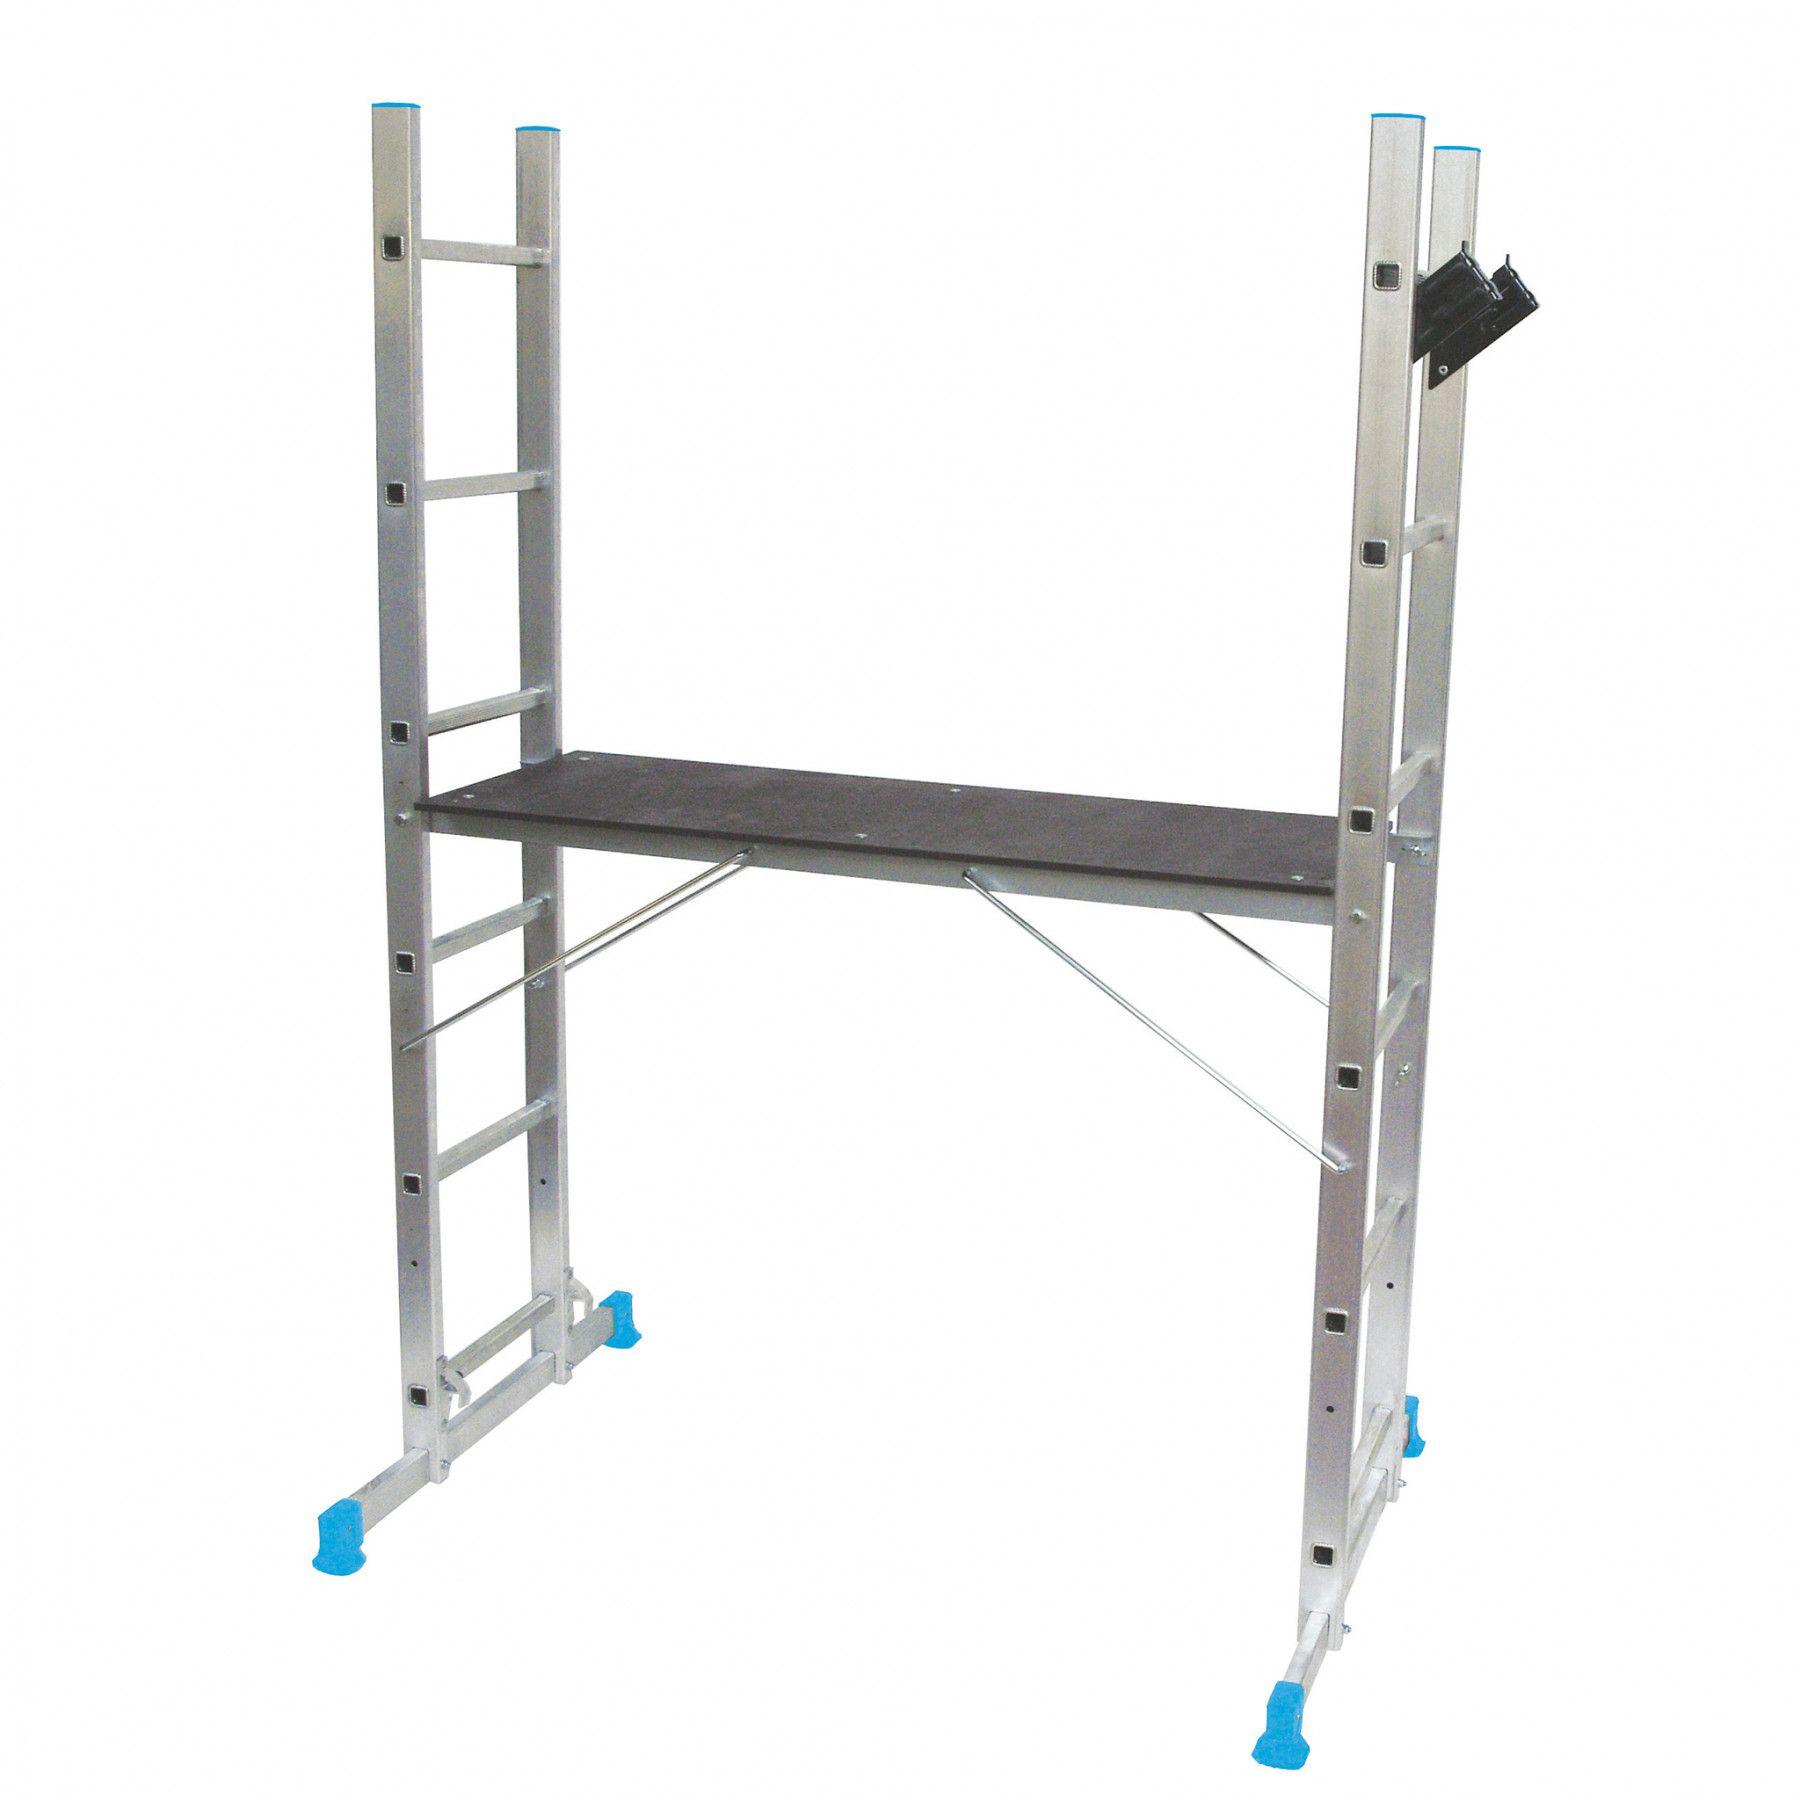 Лестница раскладная 3 в 1 MAC ALLISTER, 2 х 6 ступеней